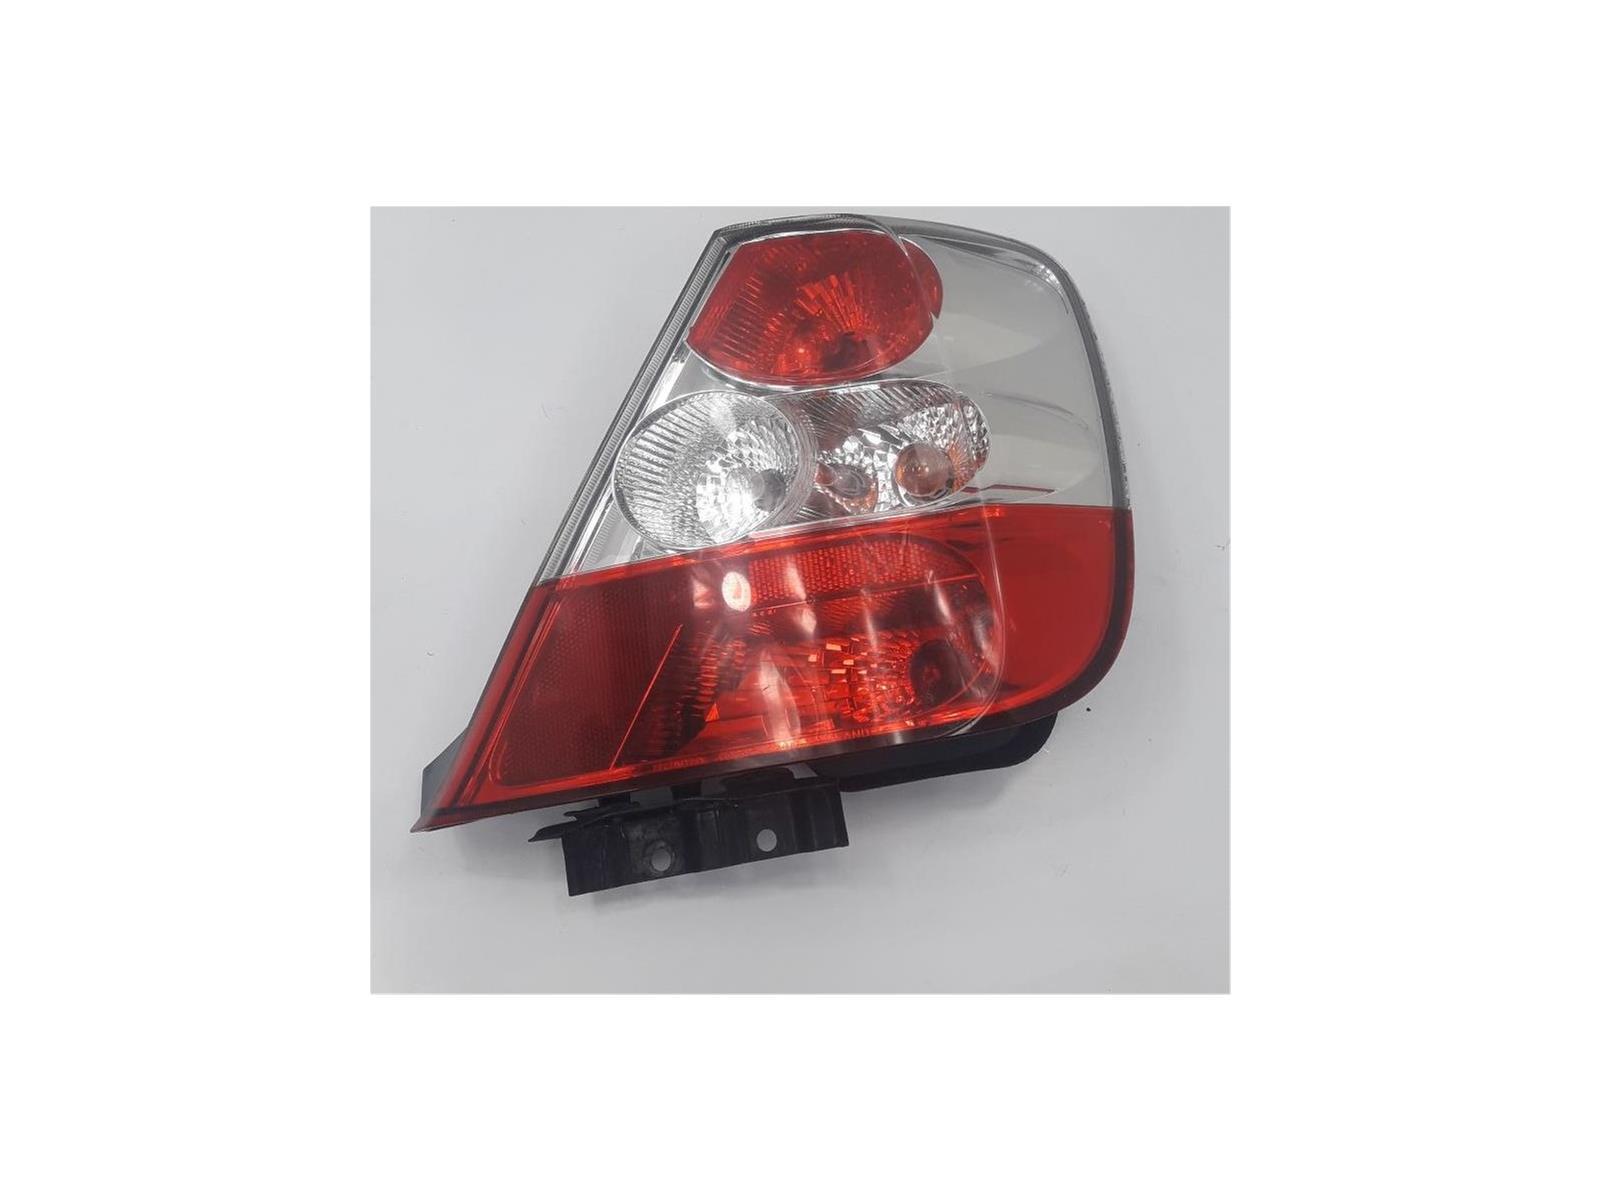 Synetiq Honda Mk7 Ep23 2000 To 2005 Se Ivtec Lamp Assembly Rear Rh Petrol Manual For Sale